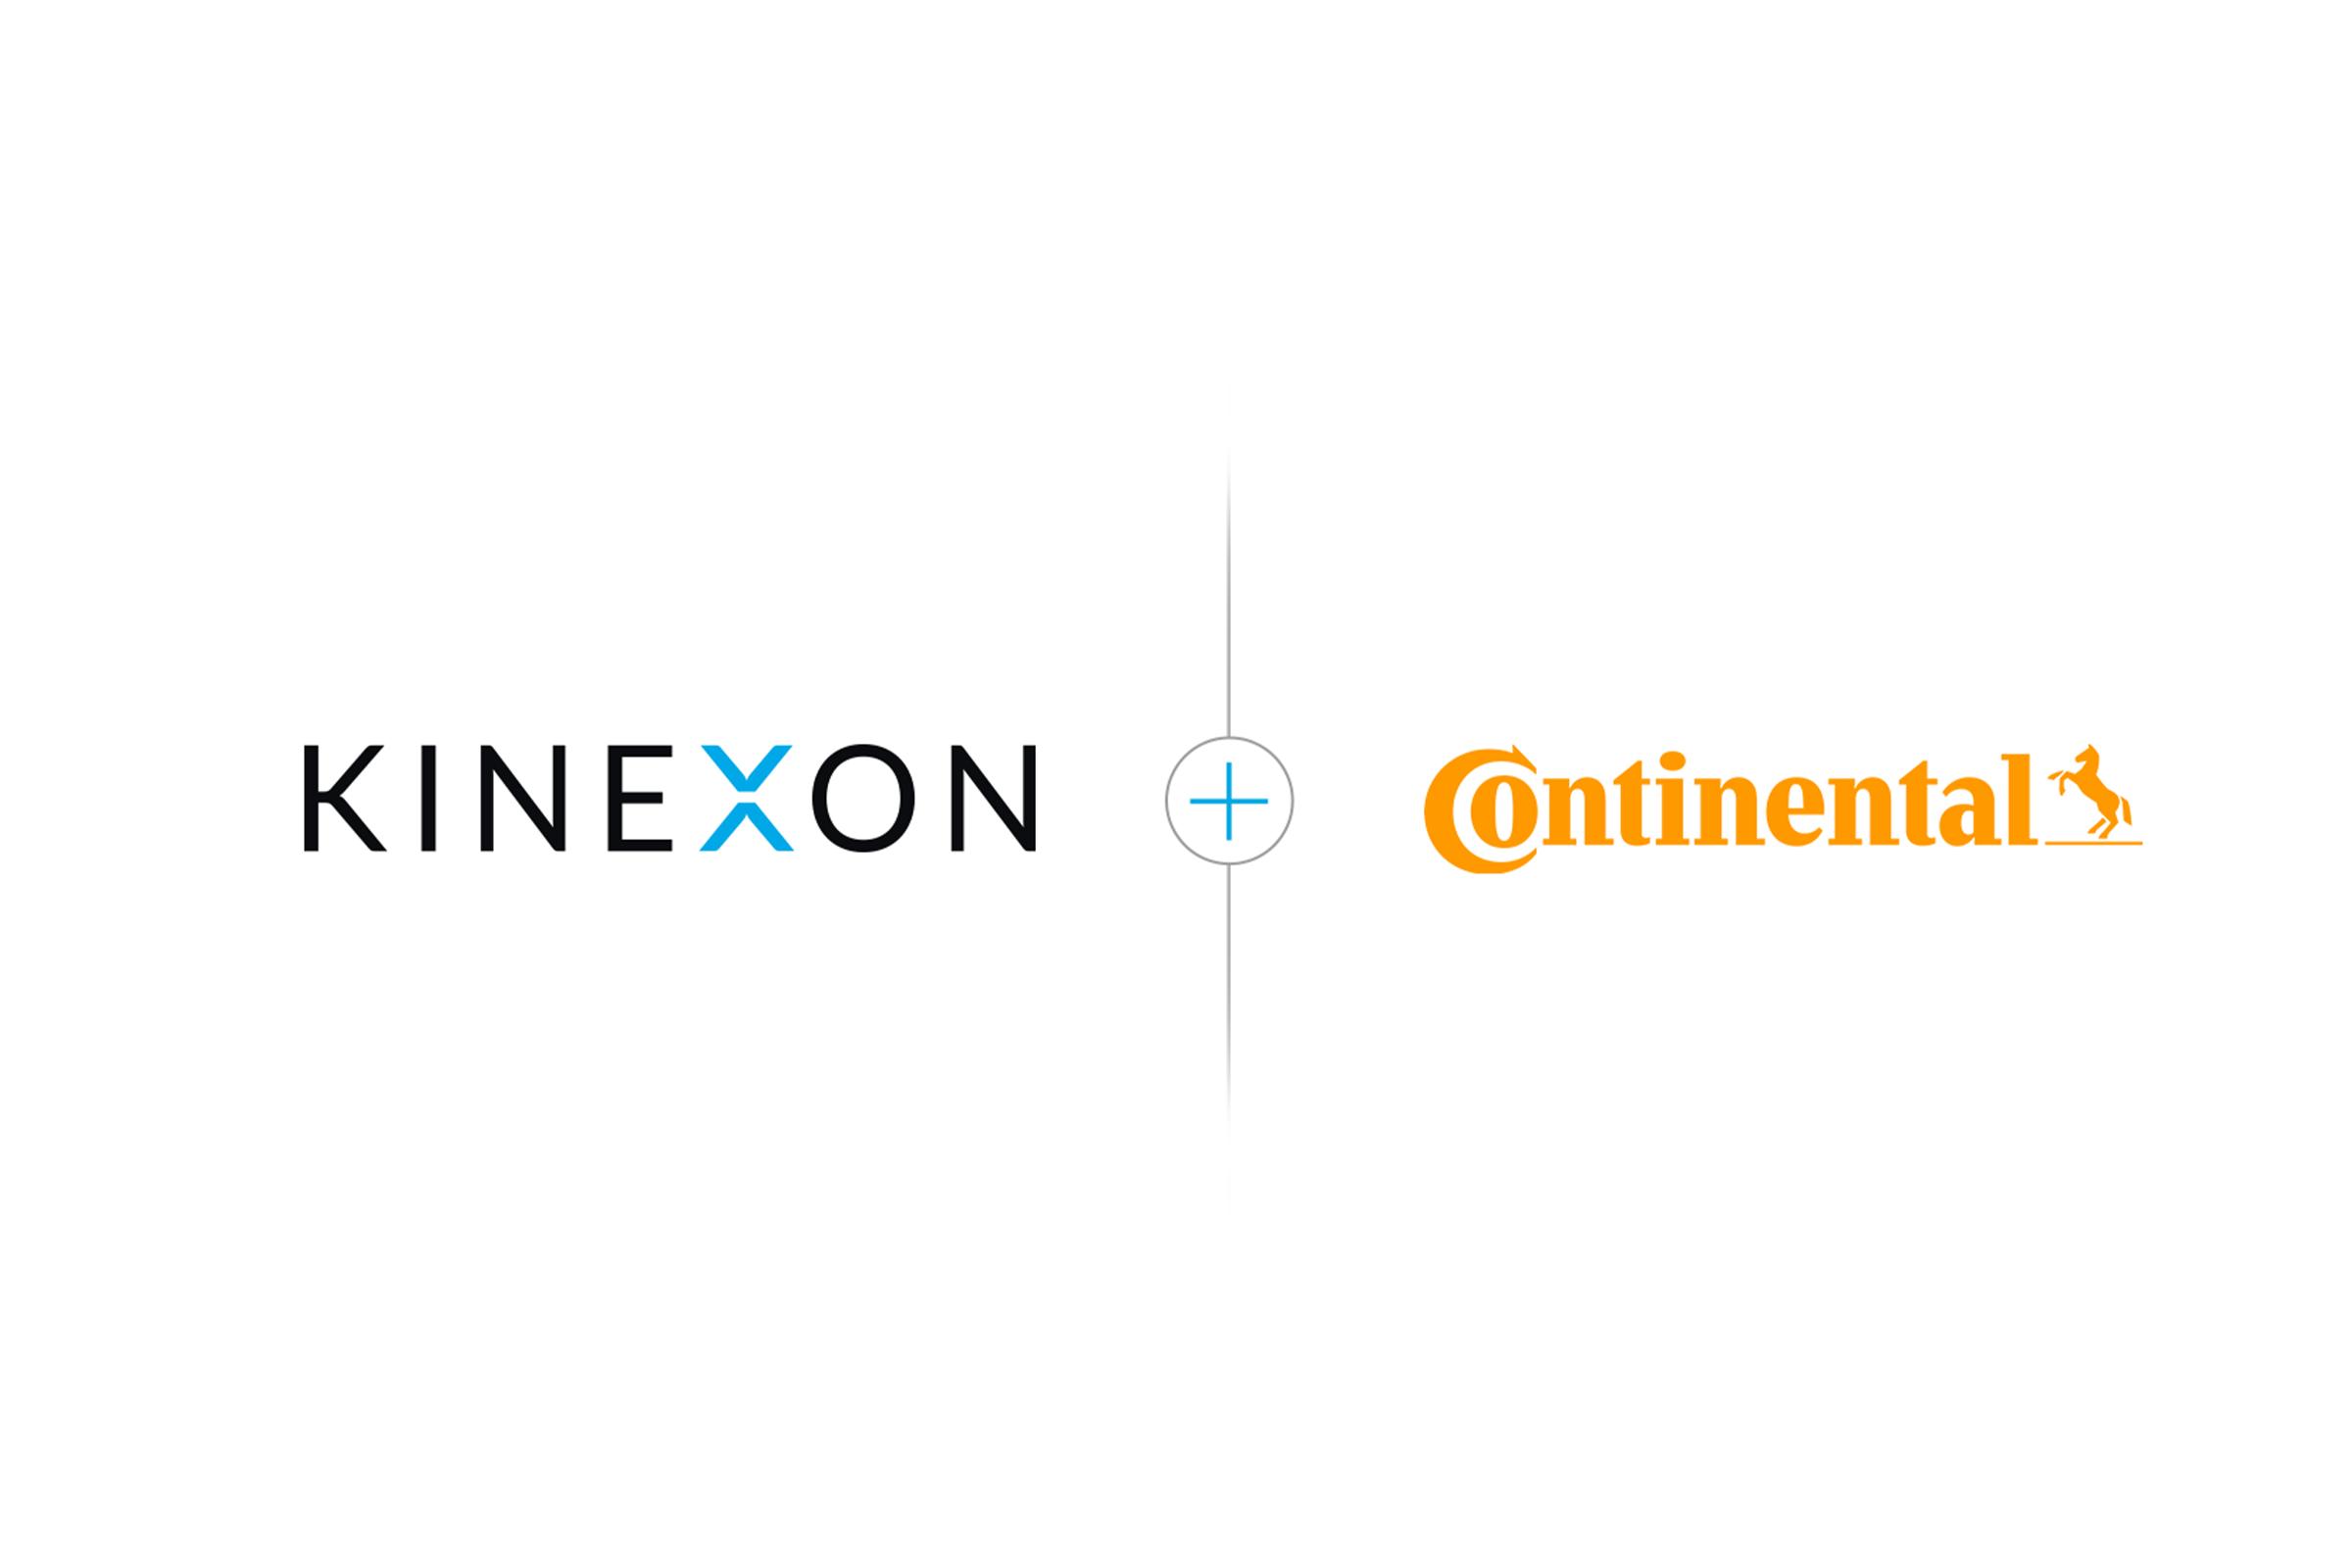 KINEXON X Continental